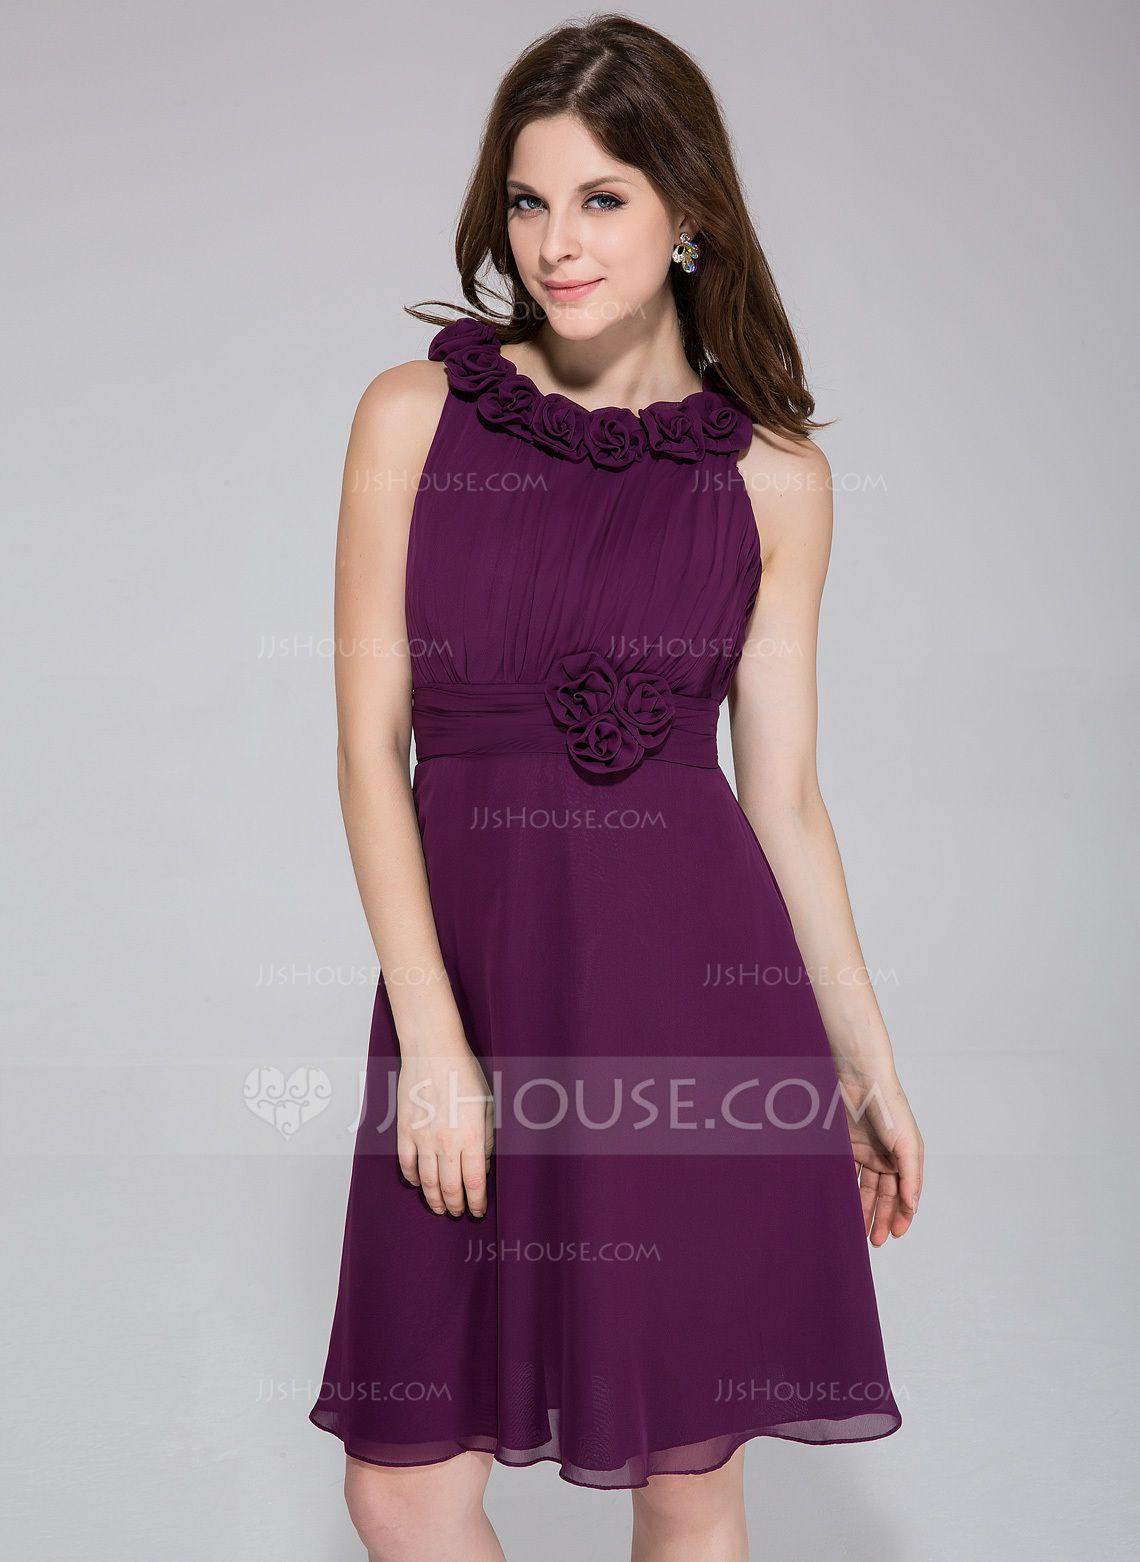 43f061f3fea6 A-Line/Princess Scoop Neck Knee-Length Chiffon Bridesmaid Dress With Ruffle  Flower(s) (007026082) - JJsHouse